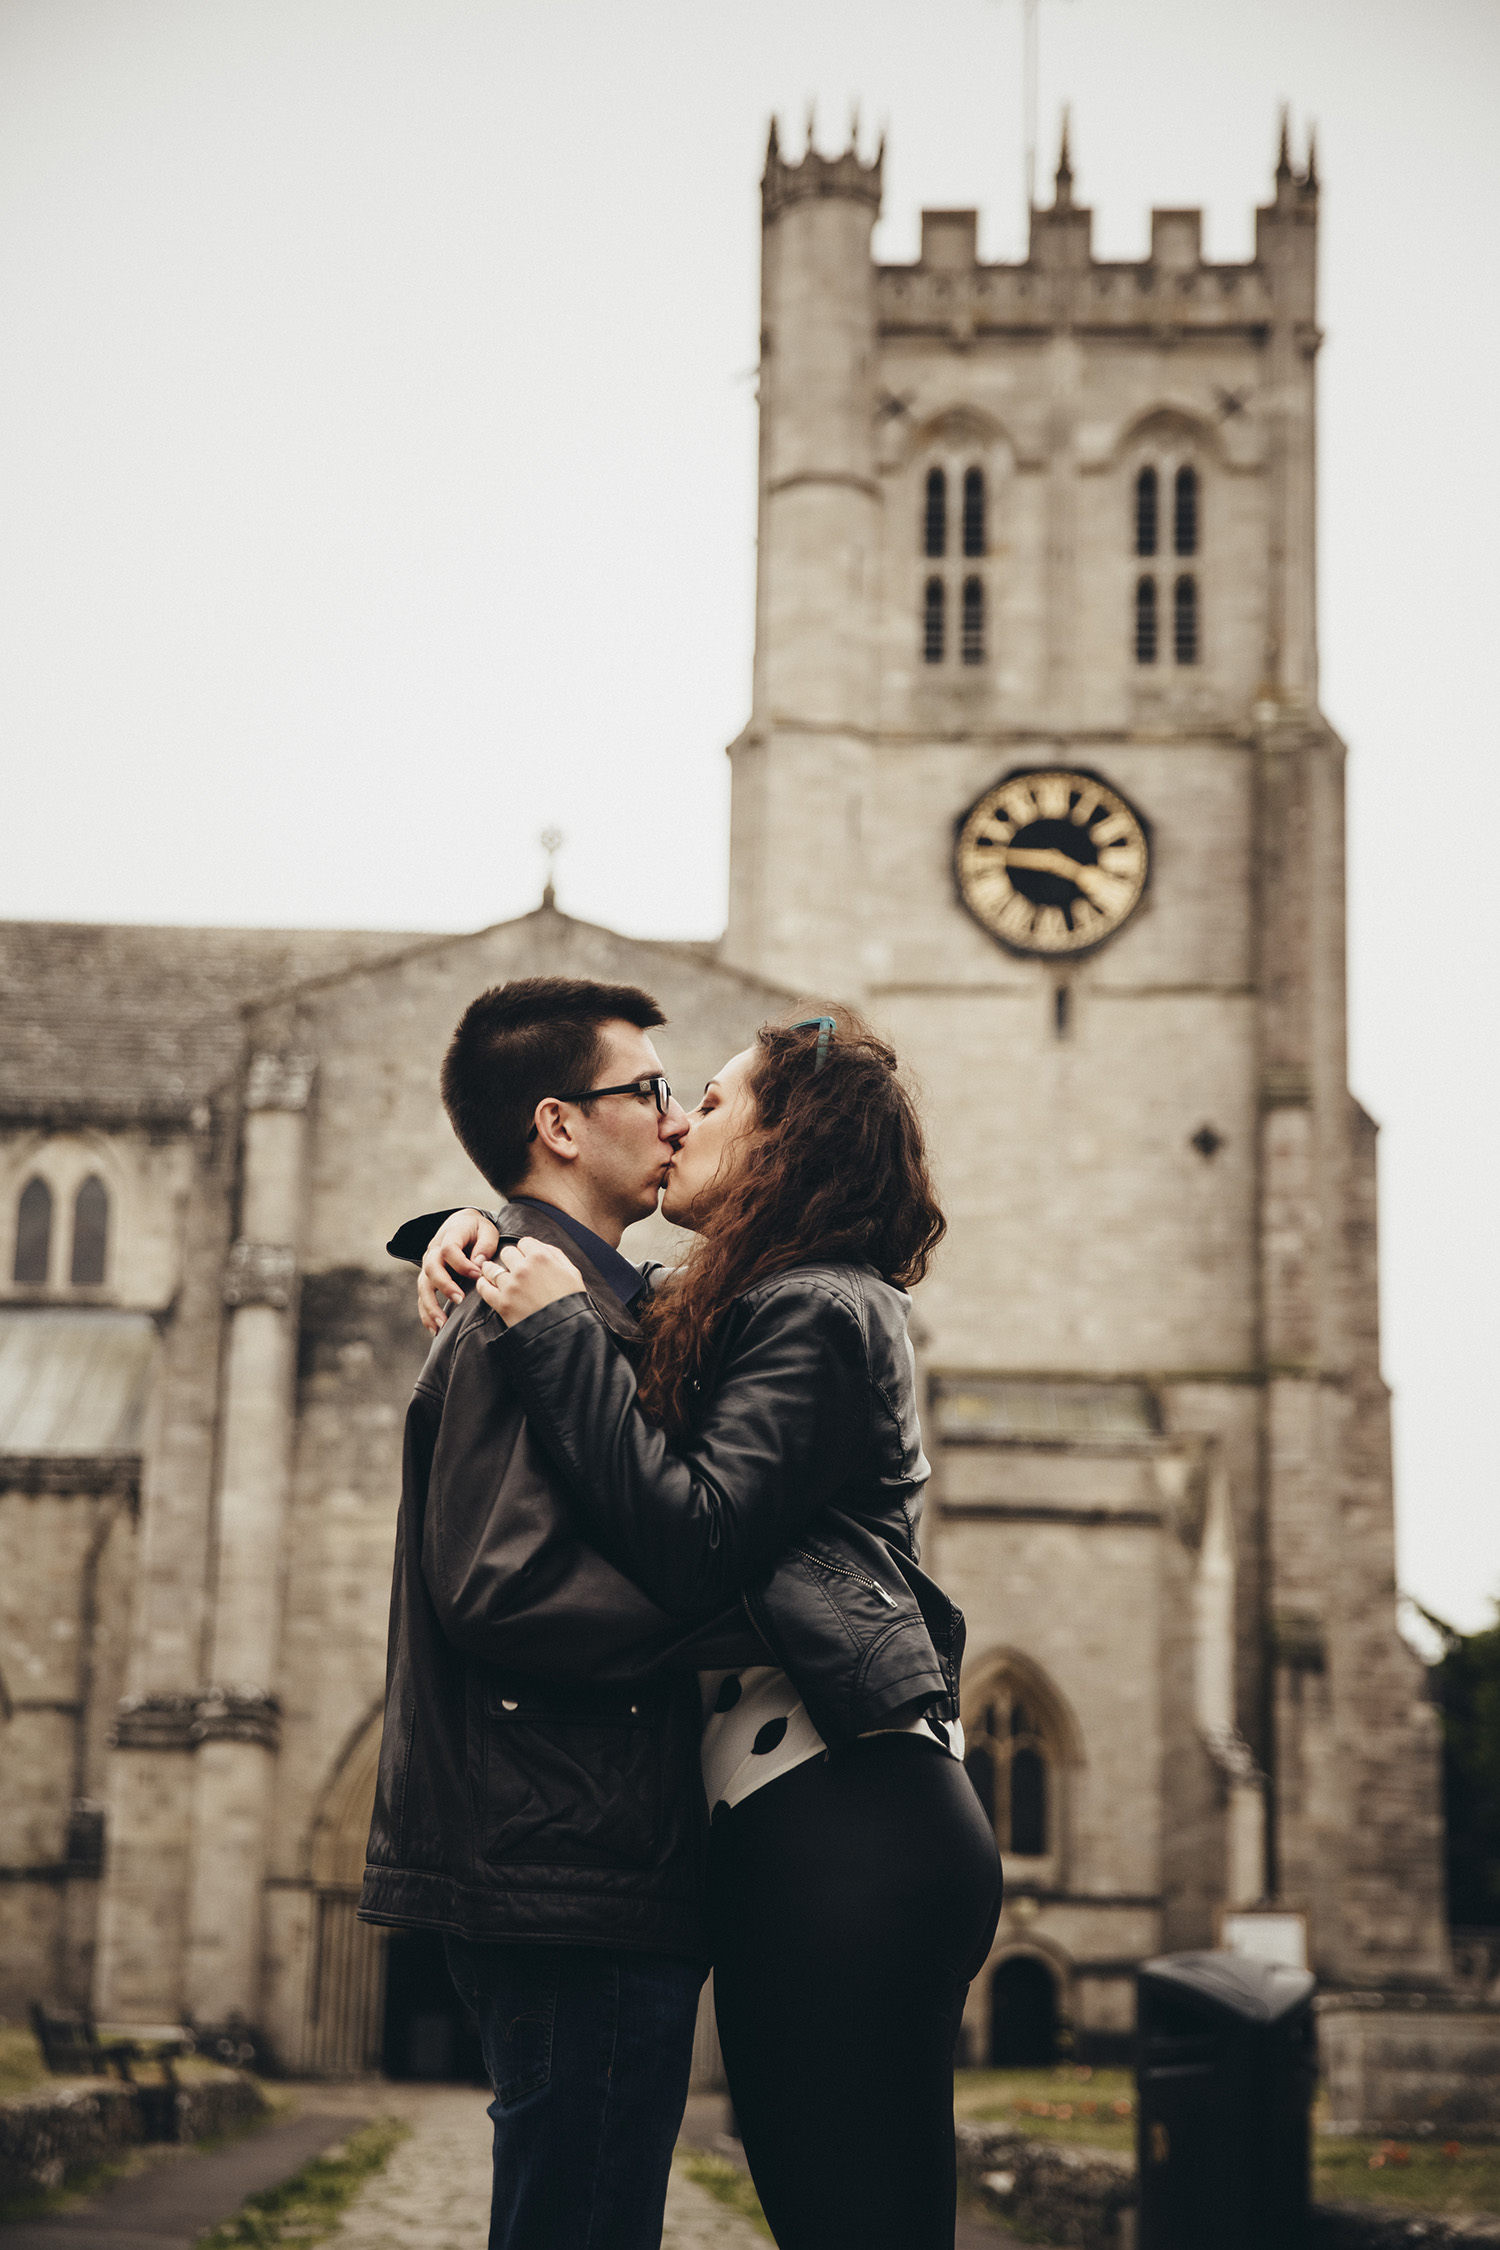 preboda_sesion_pareja_bournemouth_engagement_prewedding_couple_love_jose_reyes_photographer_wedding_photography_uk_t_prewedding_couple_love_jose_reyes_photographer_wedding_photography_uk_54.jpg